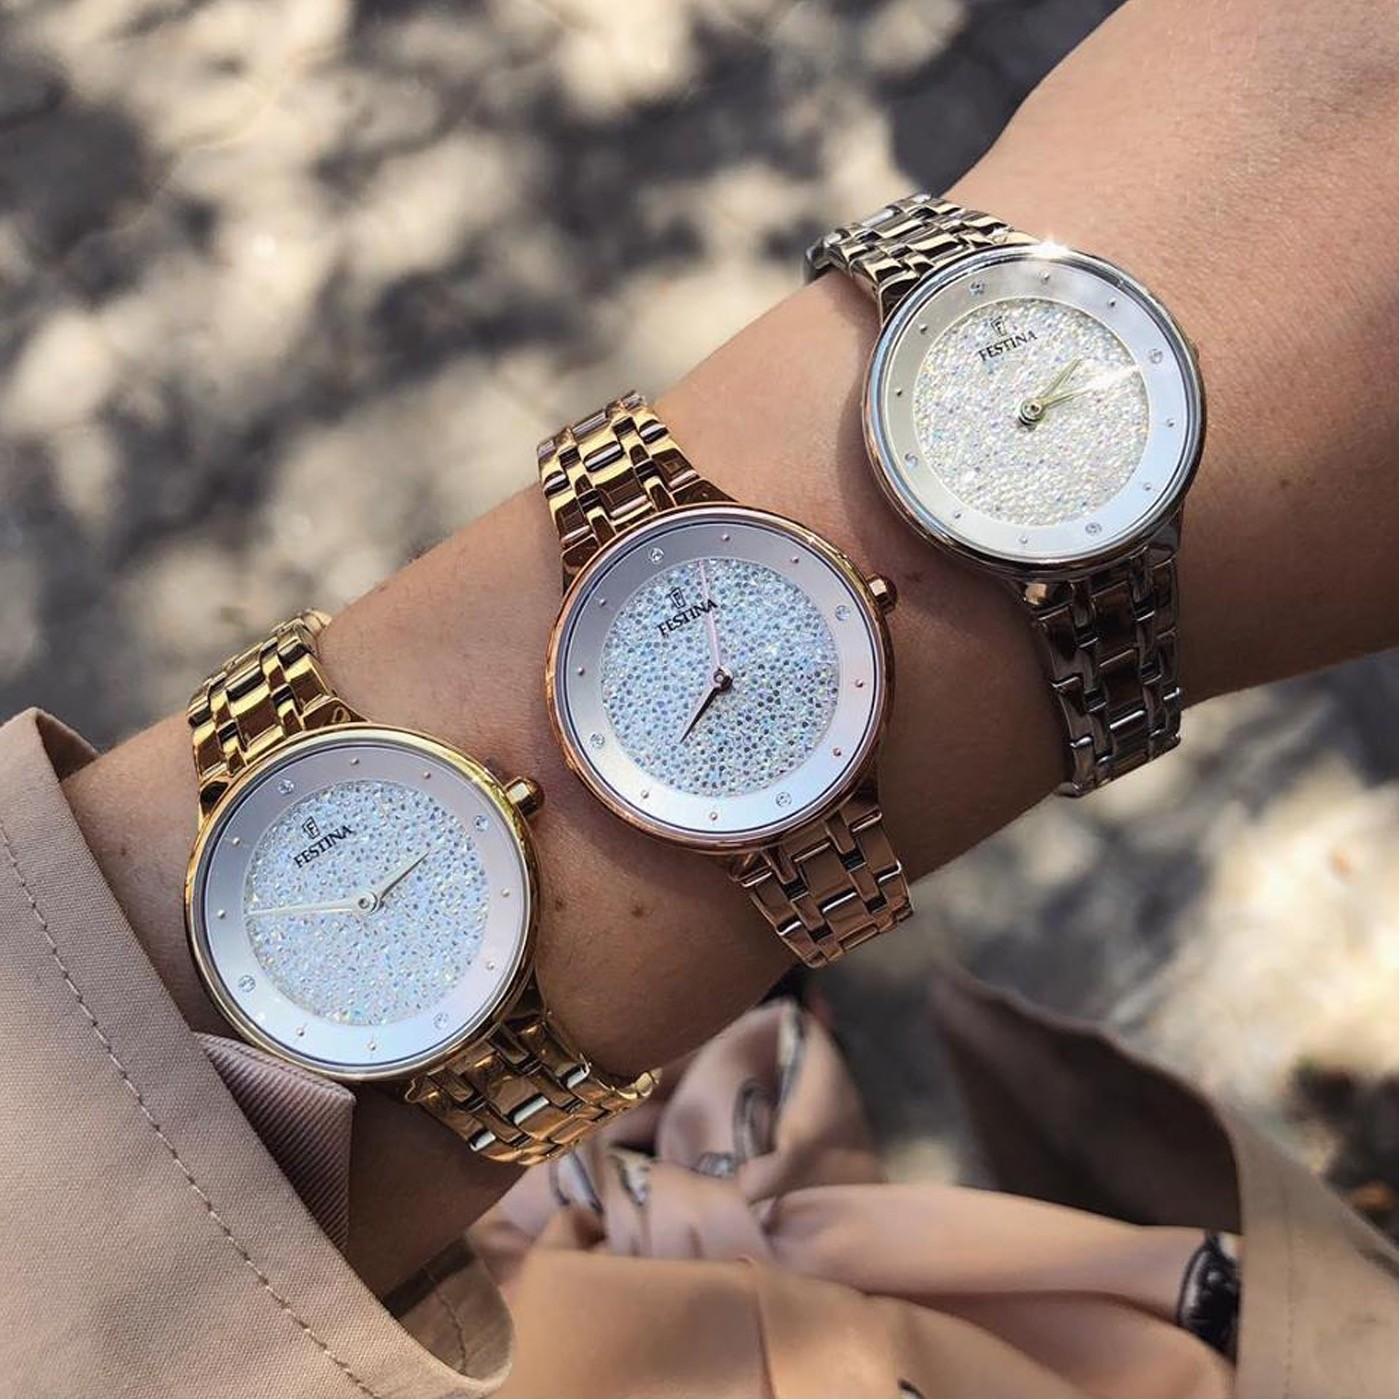 Armbanduhren von Festina